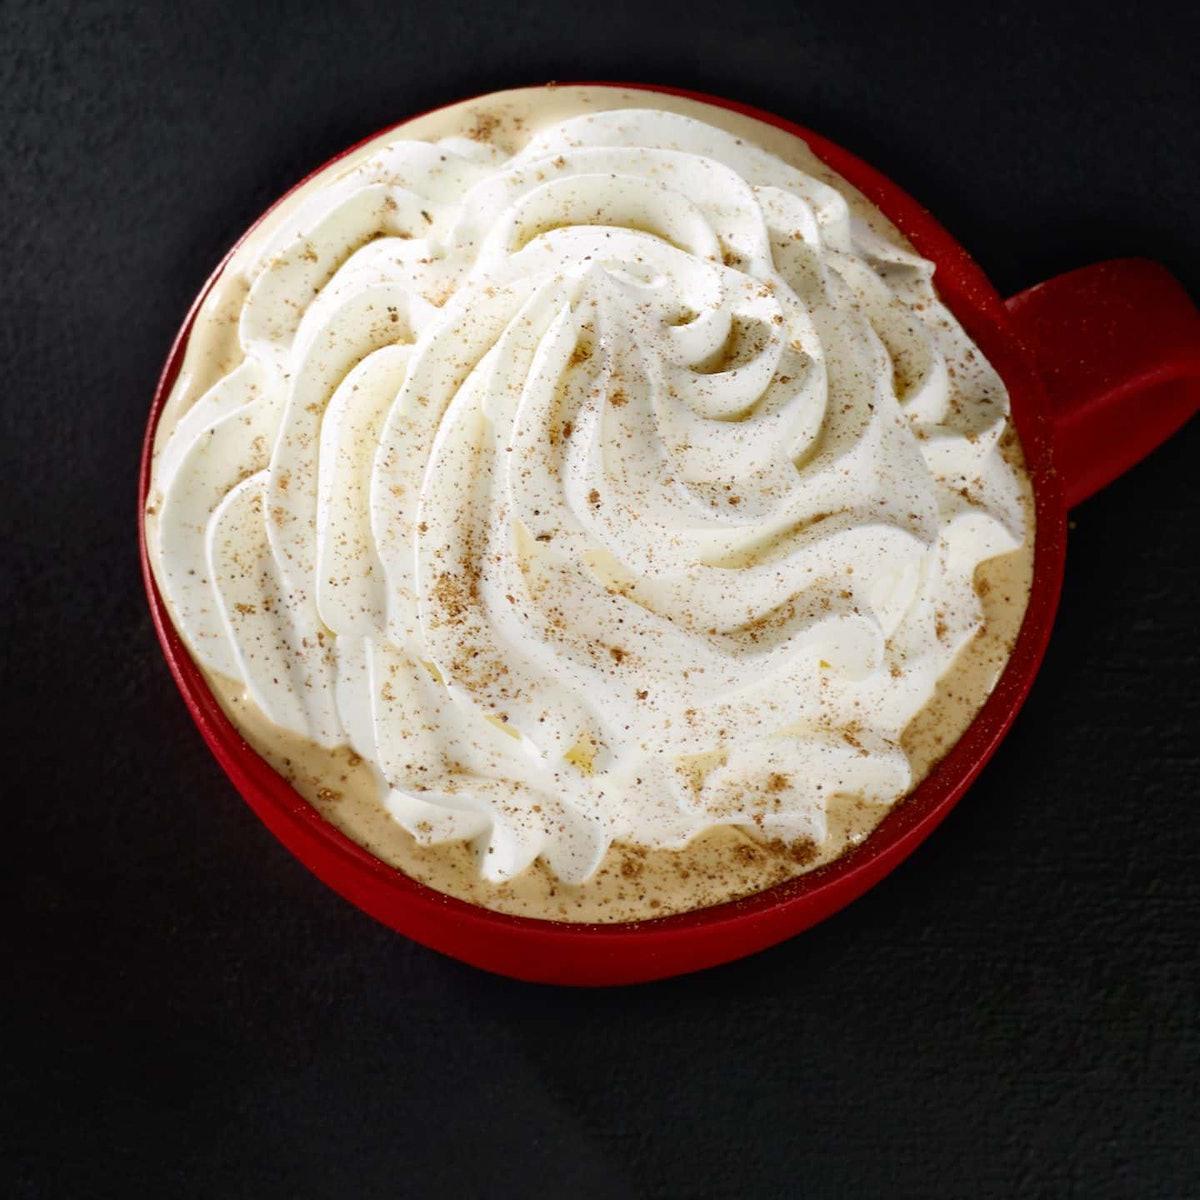 Starbucks discontinued its popular Gingerbread Latte.